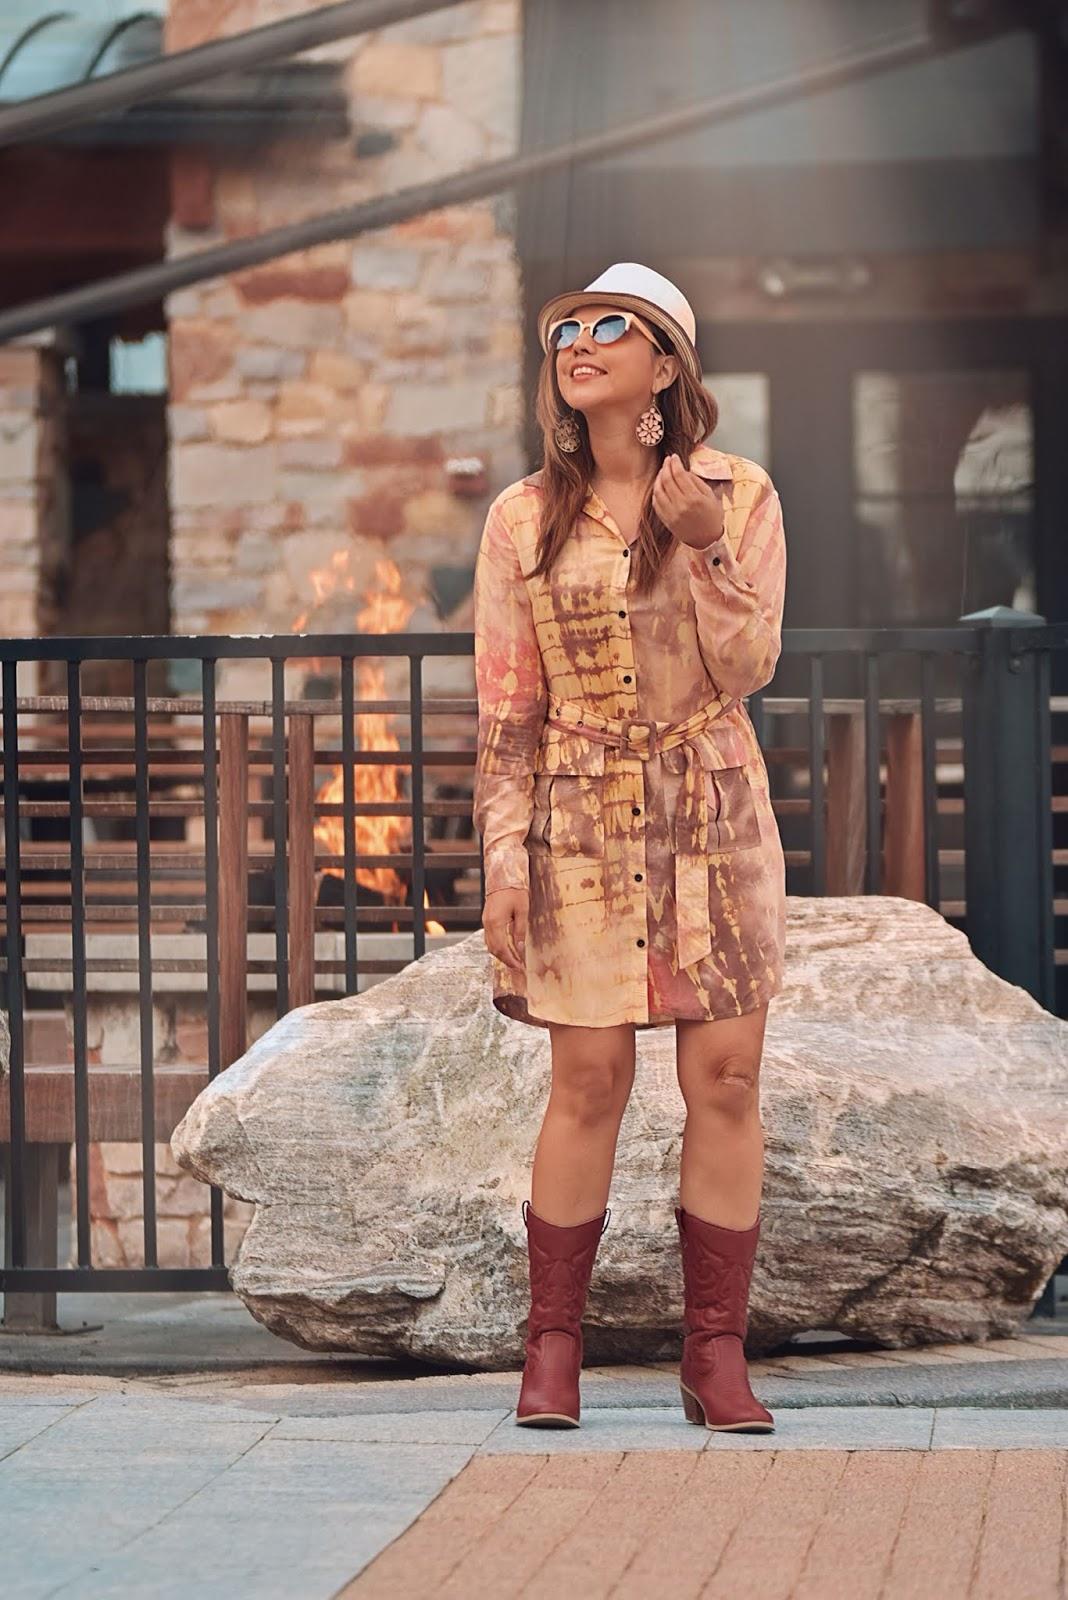 Dye Shirt Dress-MariEstilo-coachella-dessert vibes-festivalmood-dcblogger-streetstyle-cowboy boots-